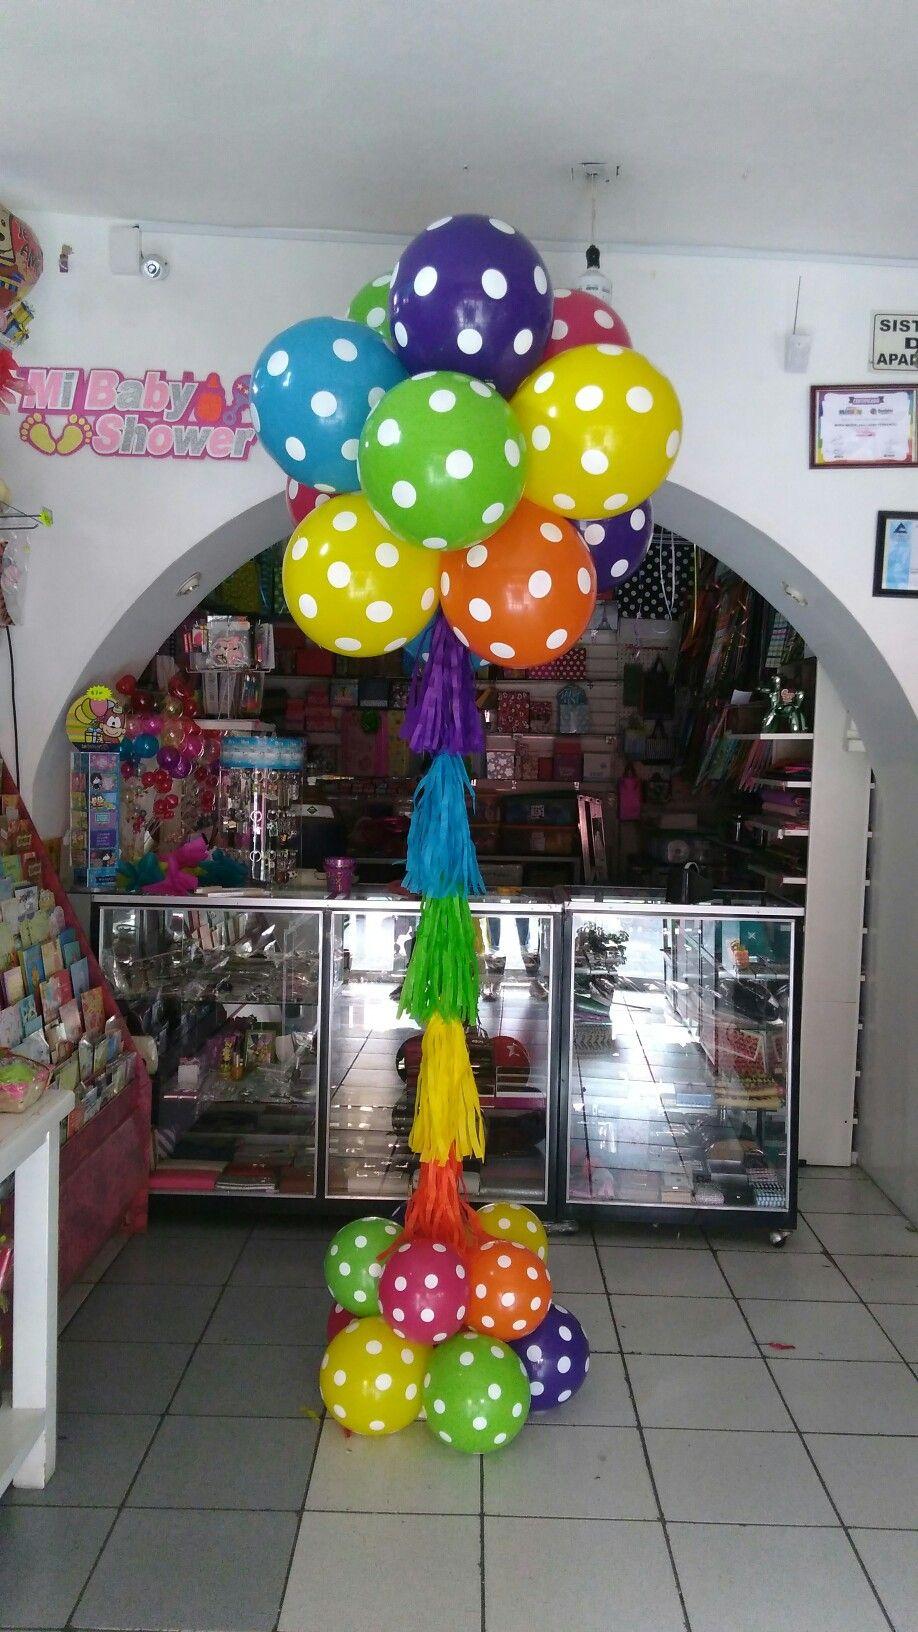 Boombox Balloon Decorations Balloons Arches Globes Balloon